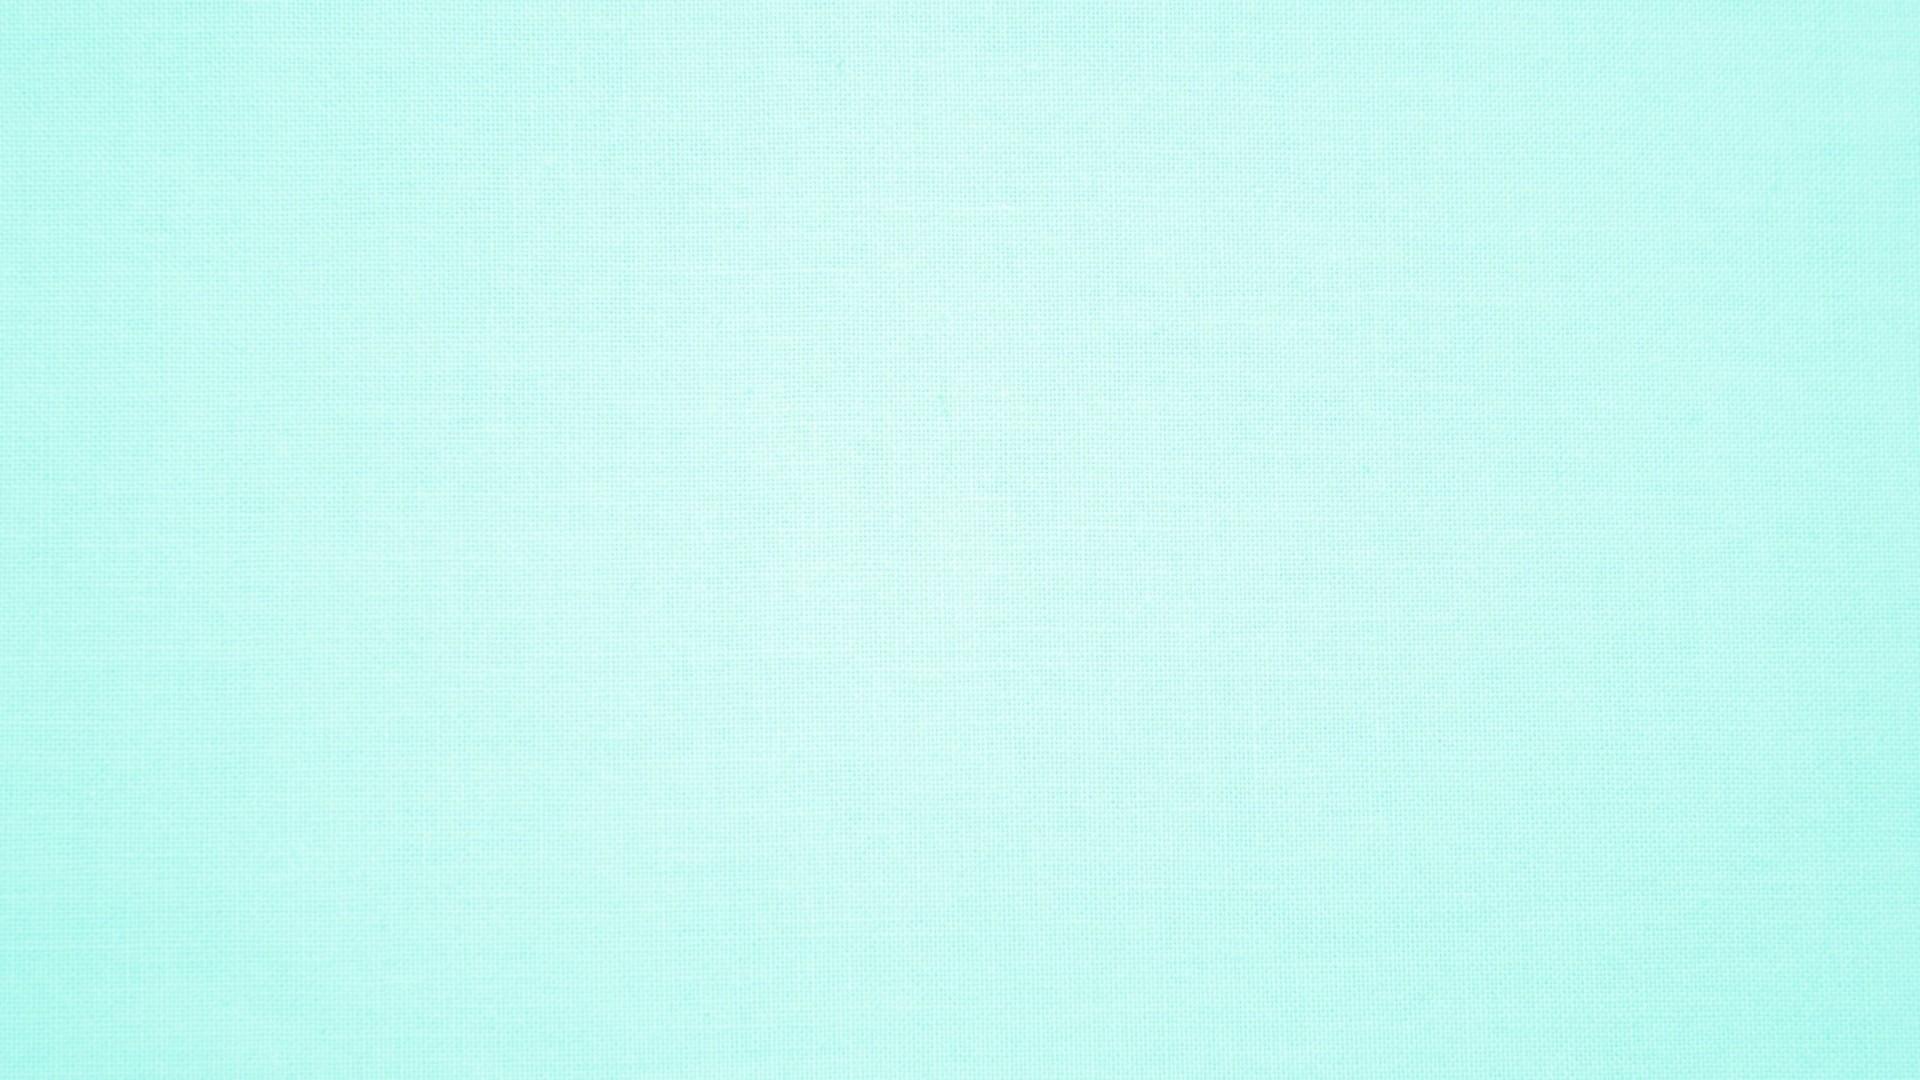 Pastel Color hd wallpaper download